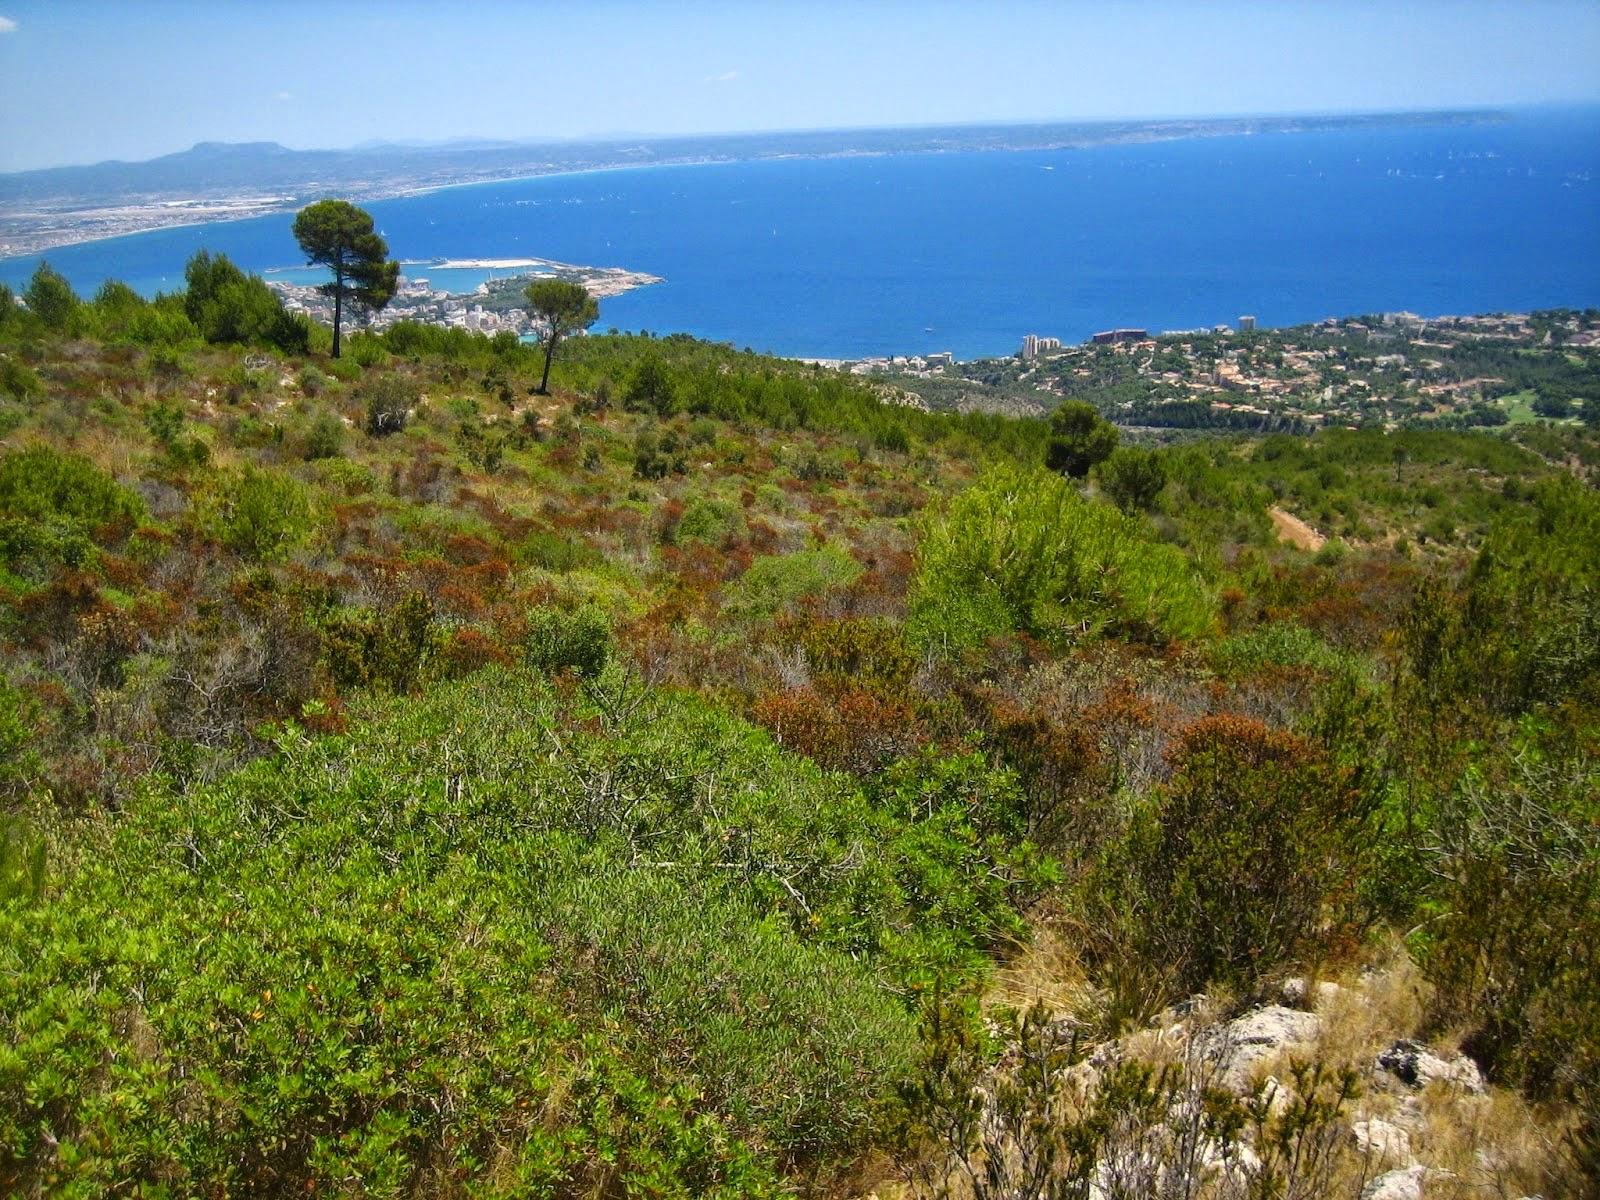 Regiones naturales mediterr nea - La mediterranea ...